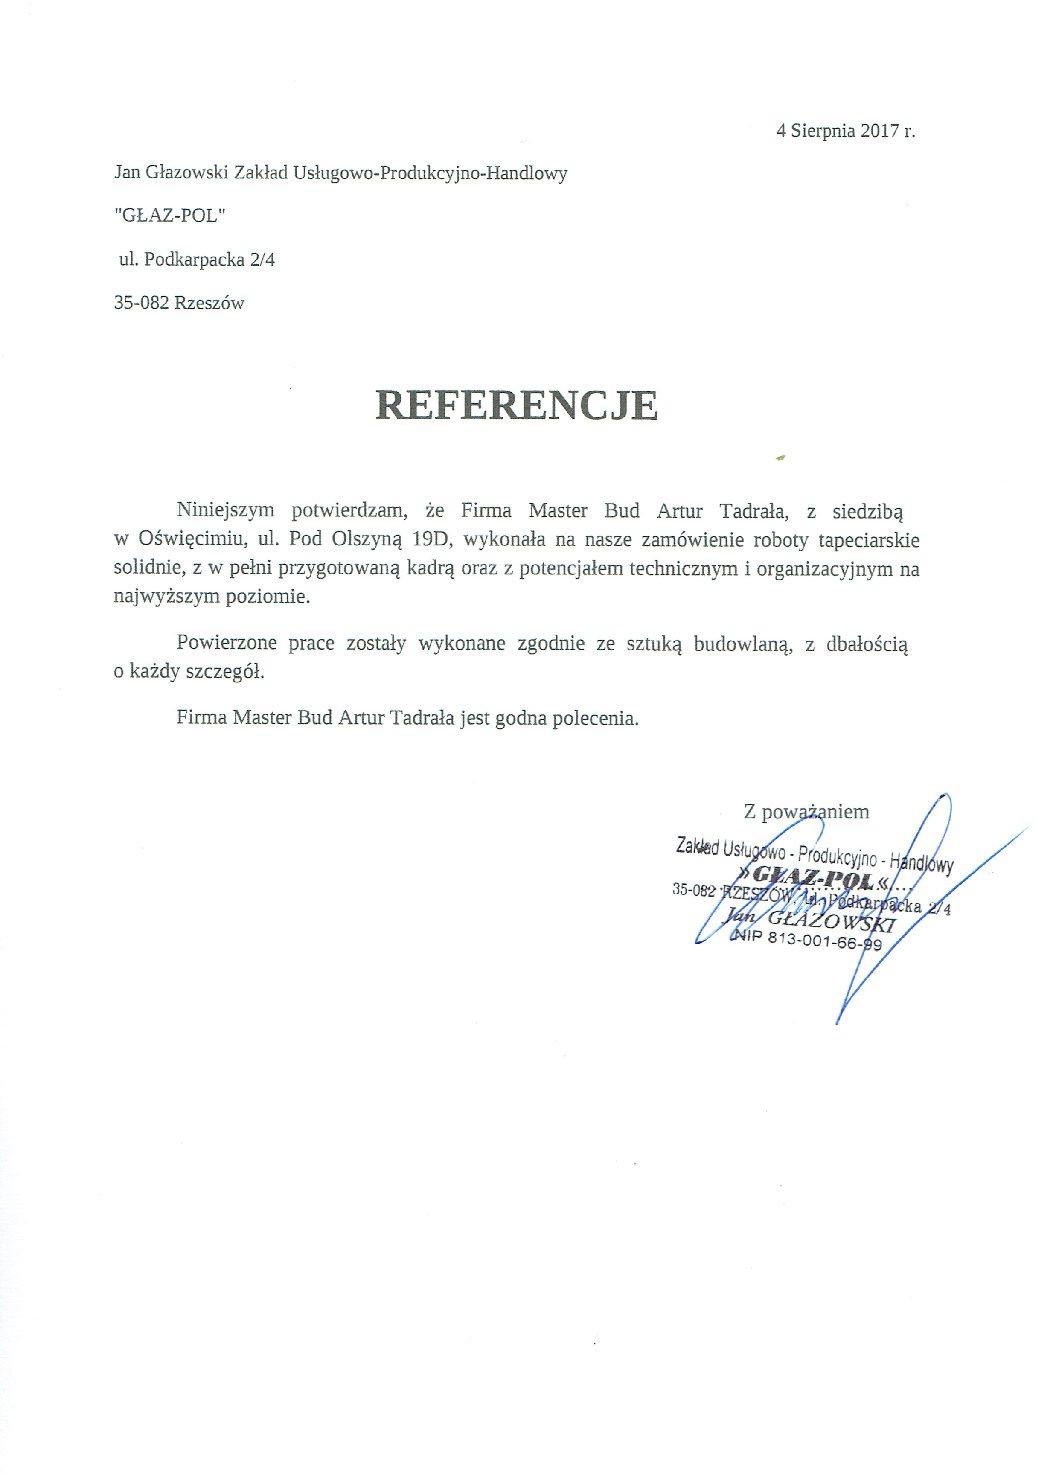 Referencje Głaz-Pol